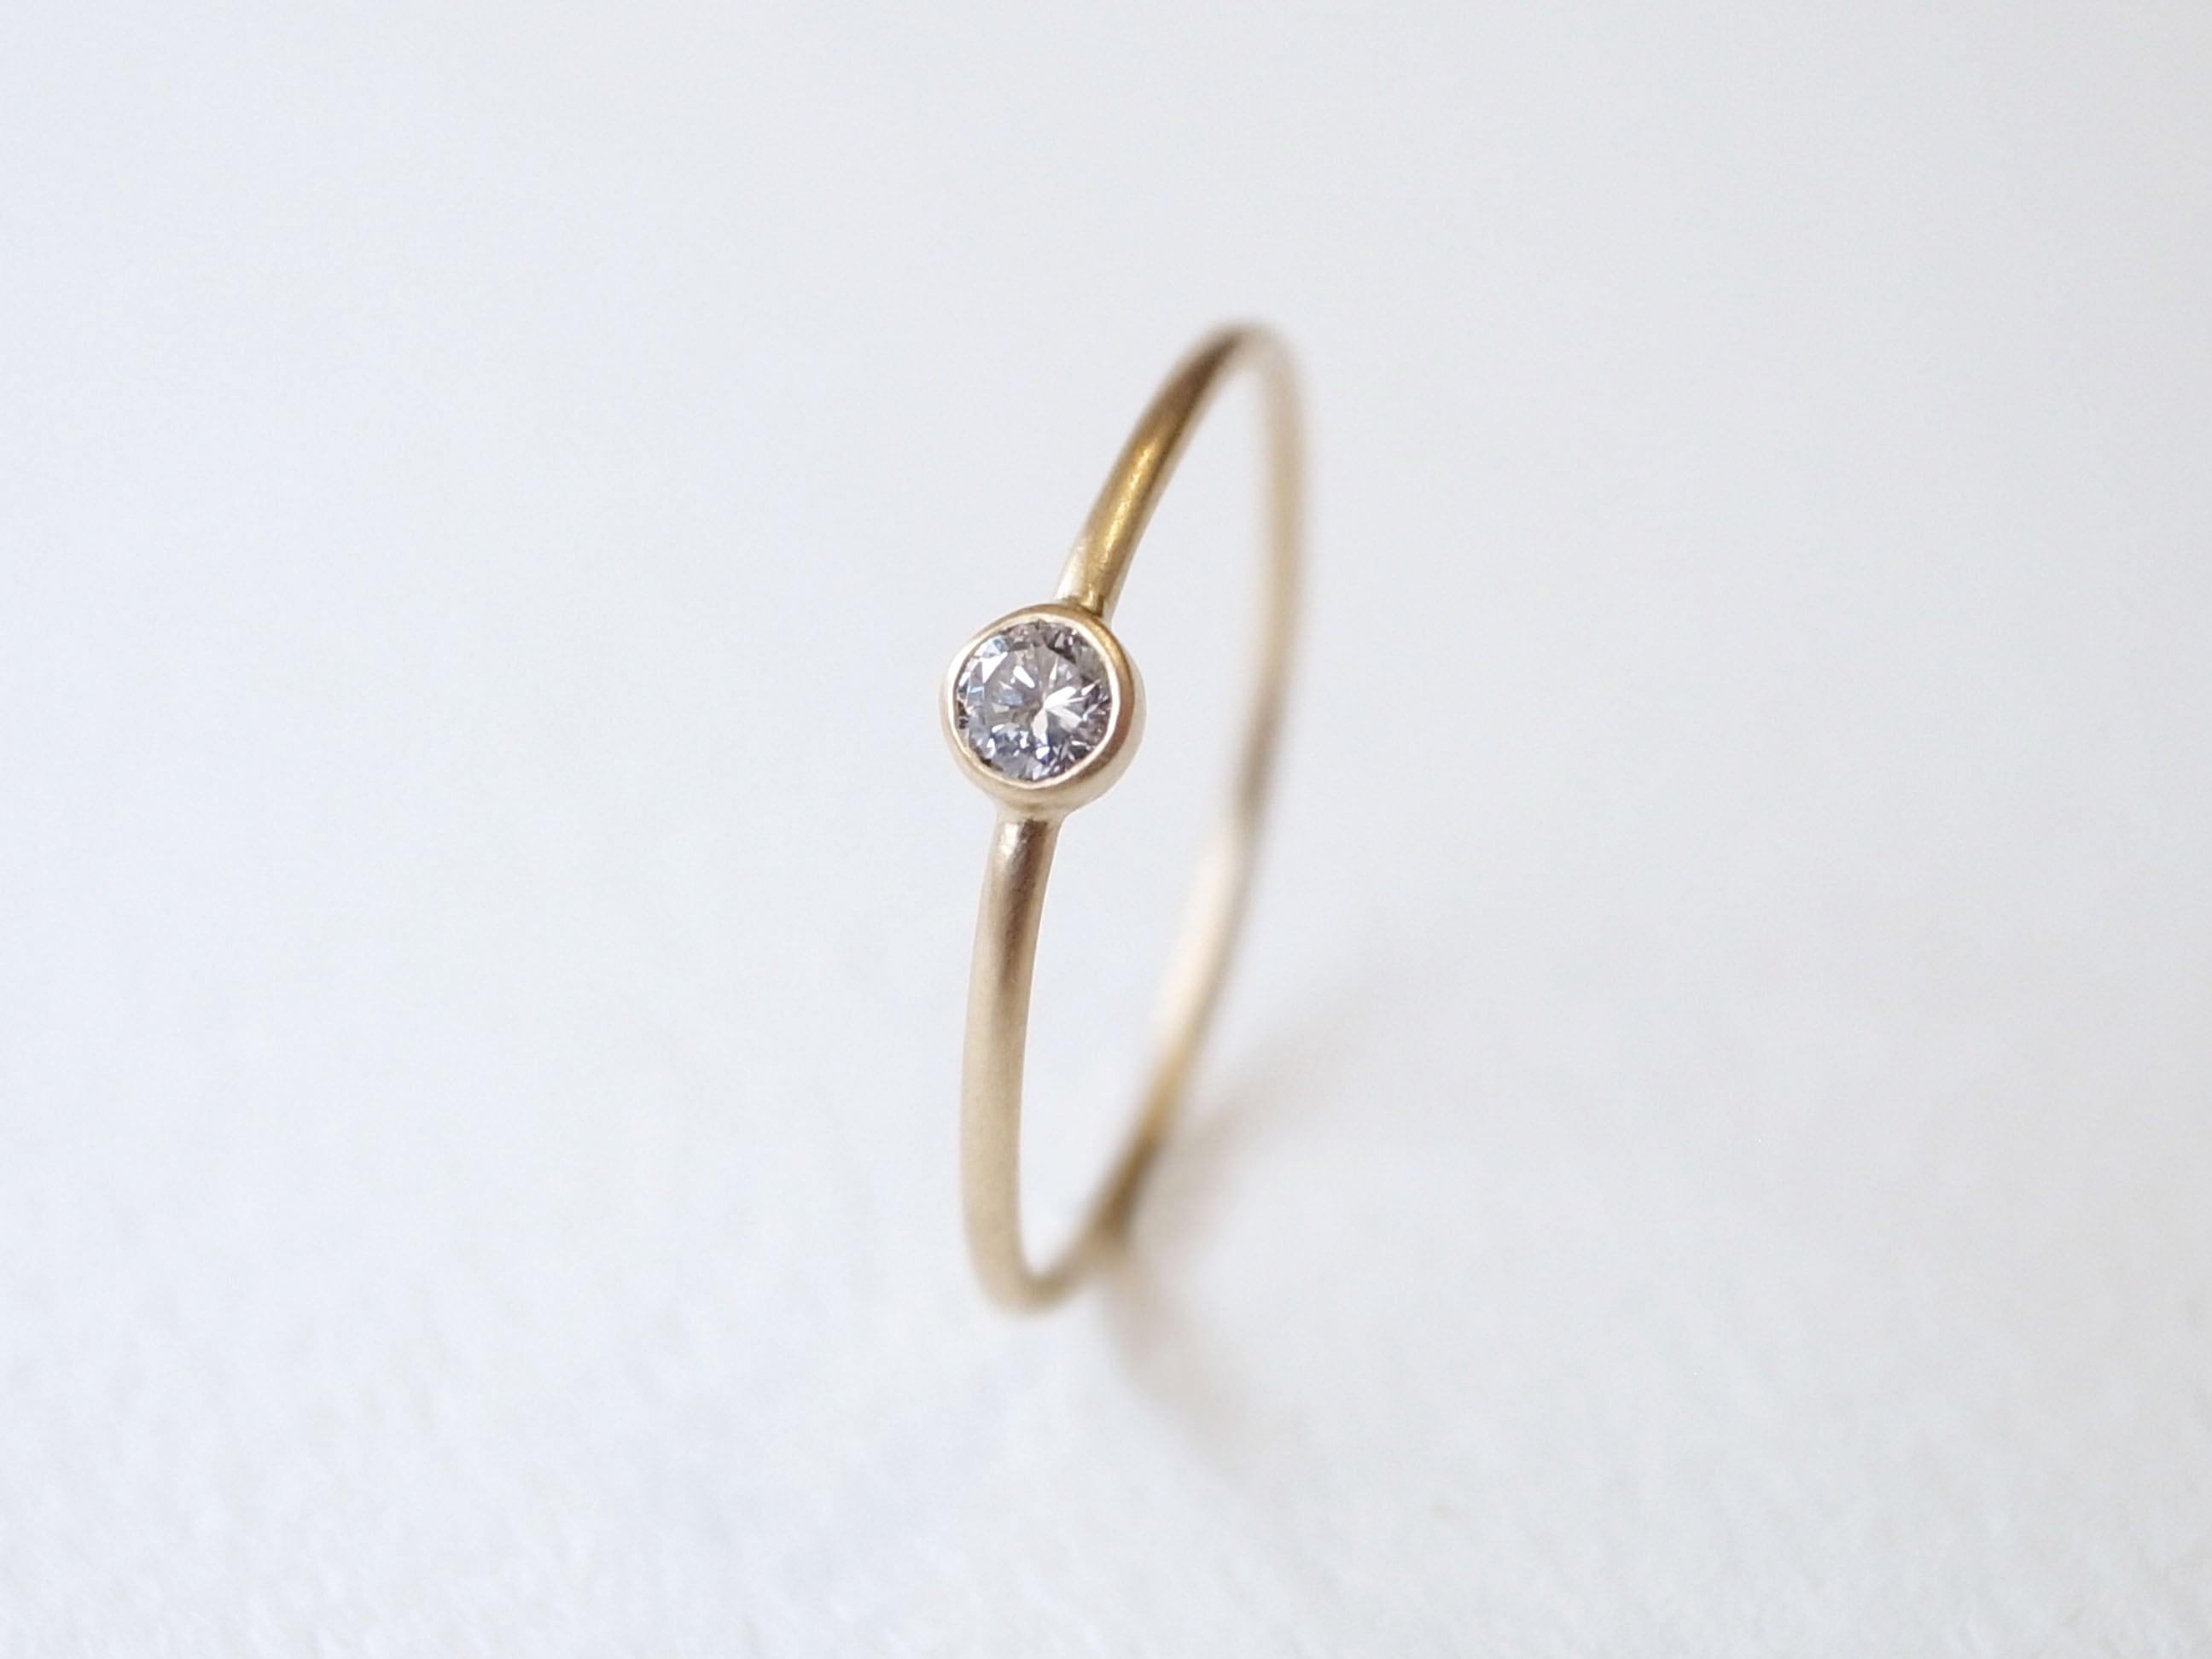 K18YG Diamond/2.5round grain ring